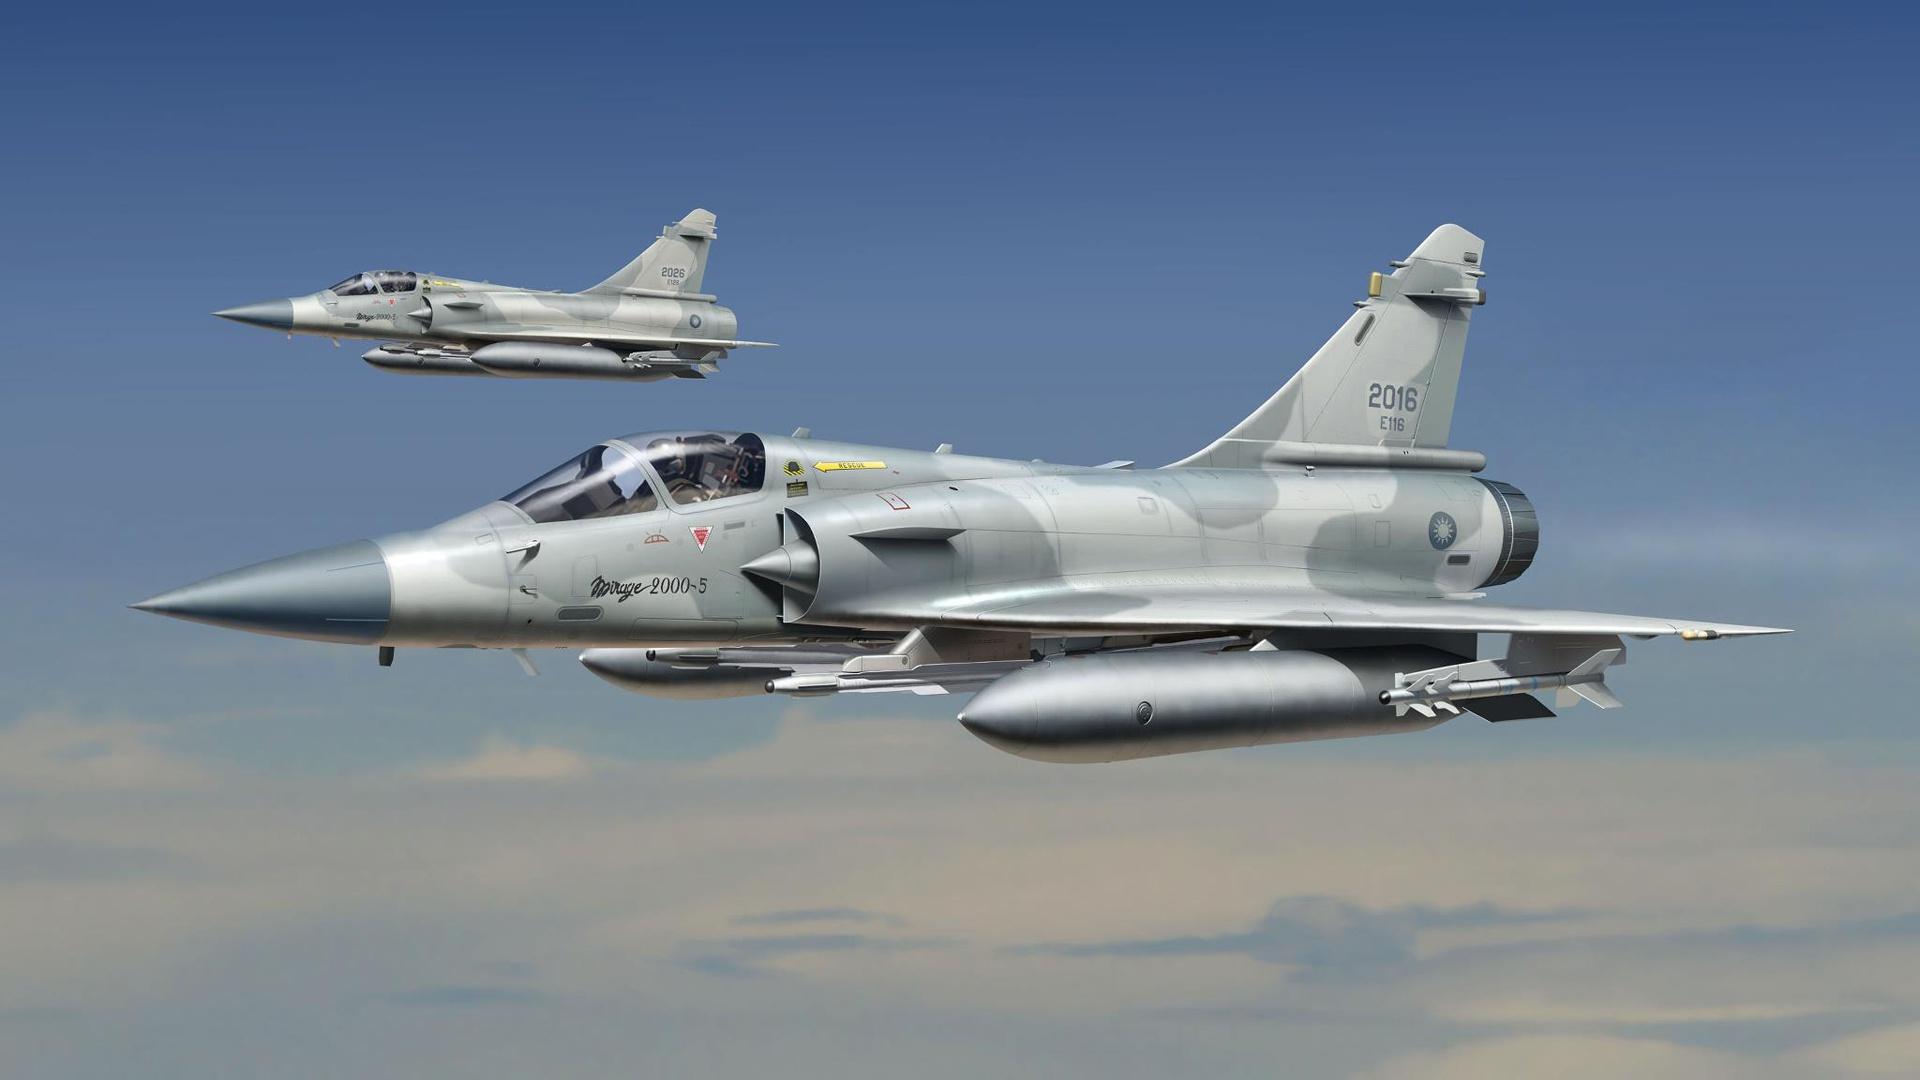 Wallpaper Artwork Mirage 2000 Vehicle Military Aircraft